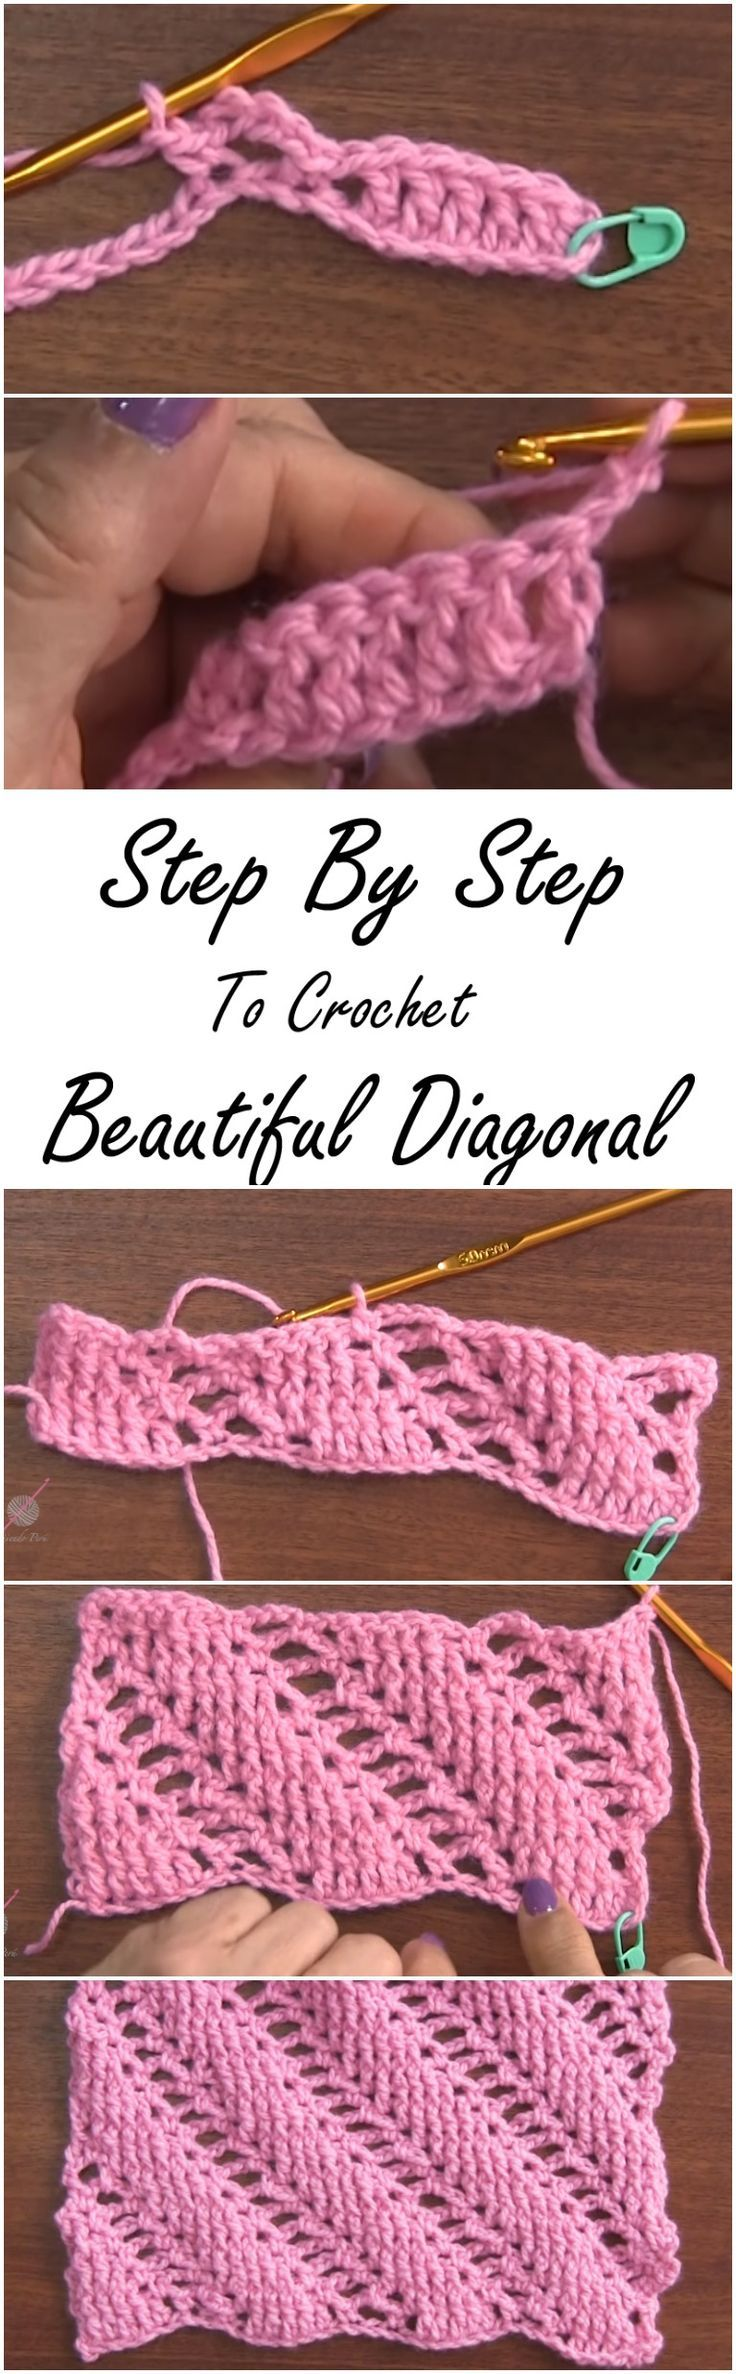 Crochet Stitched Diagonal Bars Tutorial | Puntadas, Tejido y Ganchillo